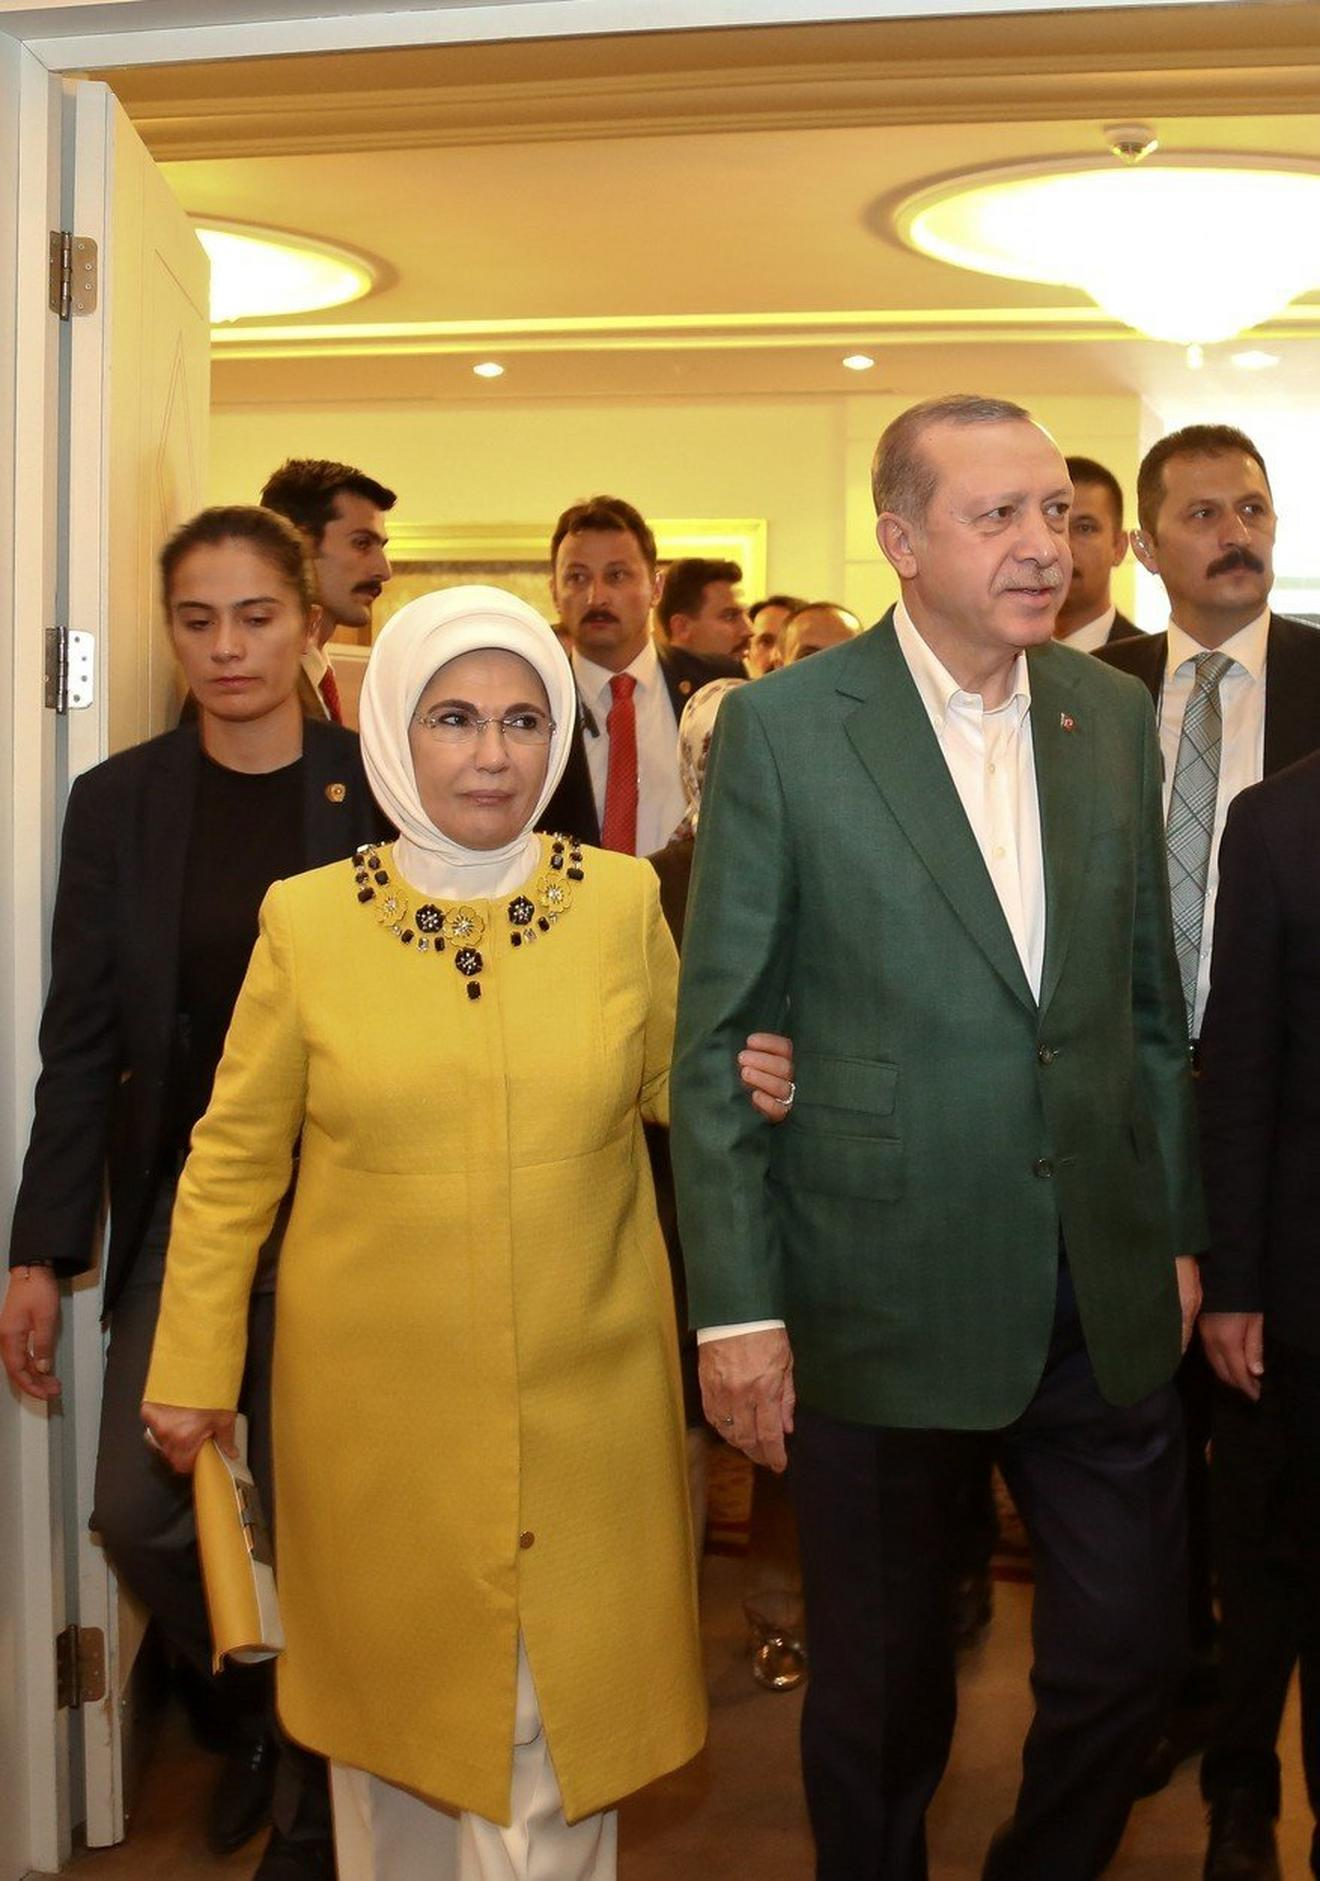 Na konferenciji Partije pravde i razvoja, stranke njenog supruga